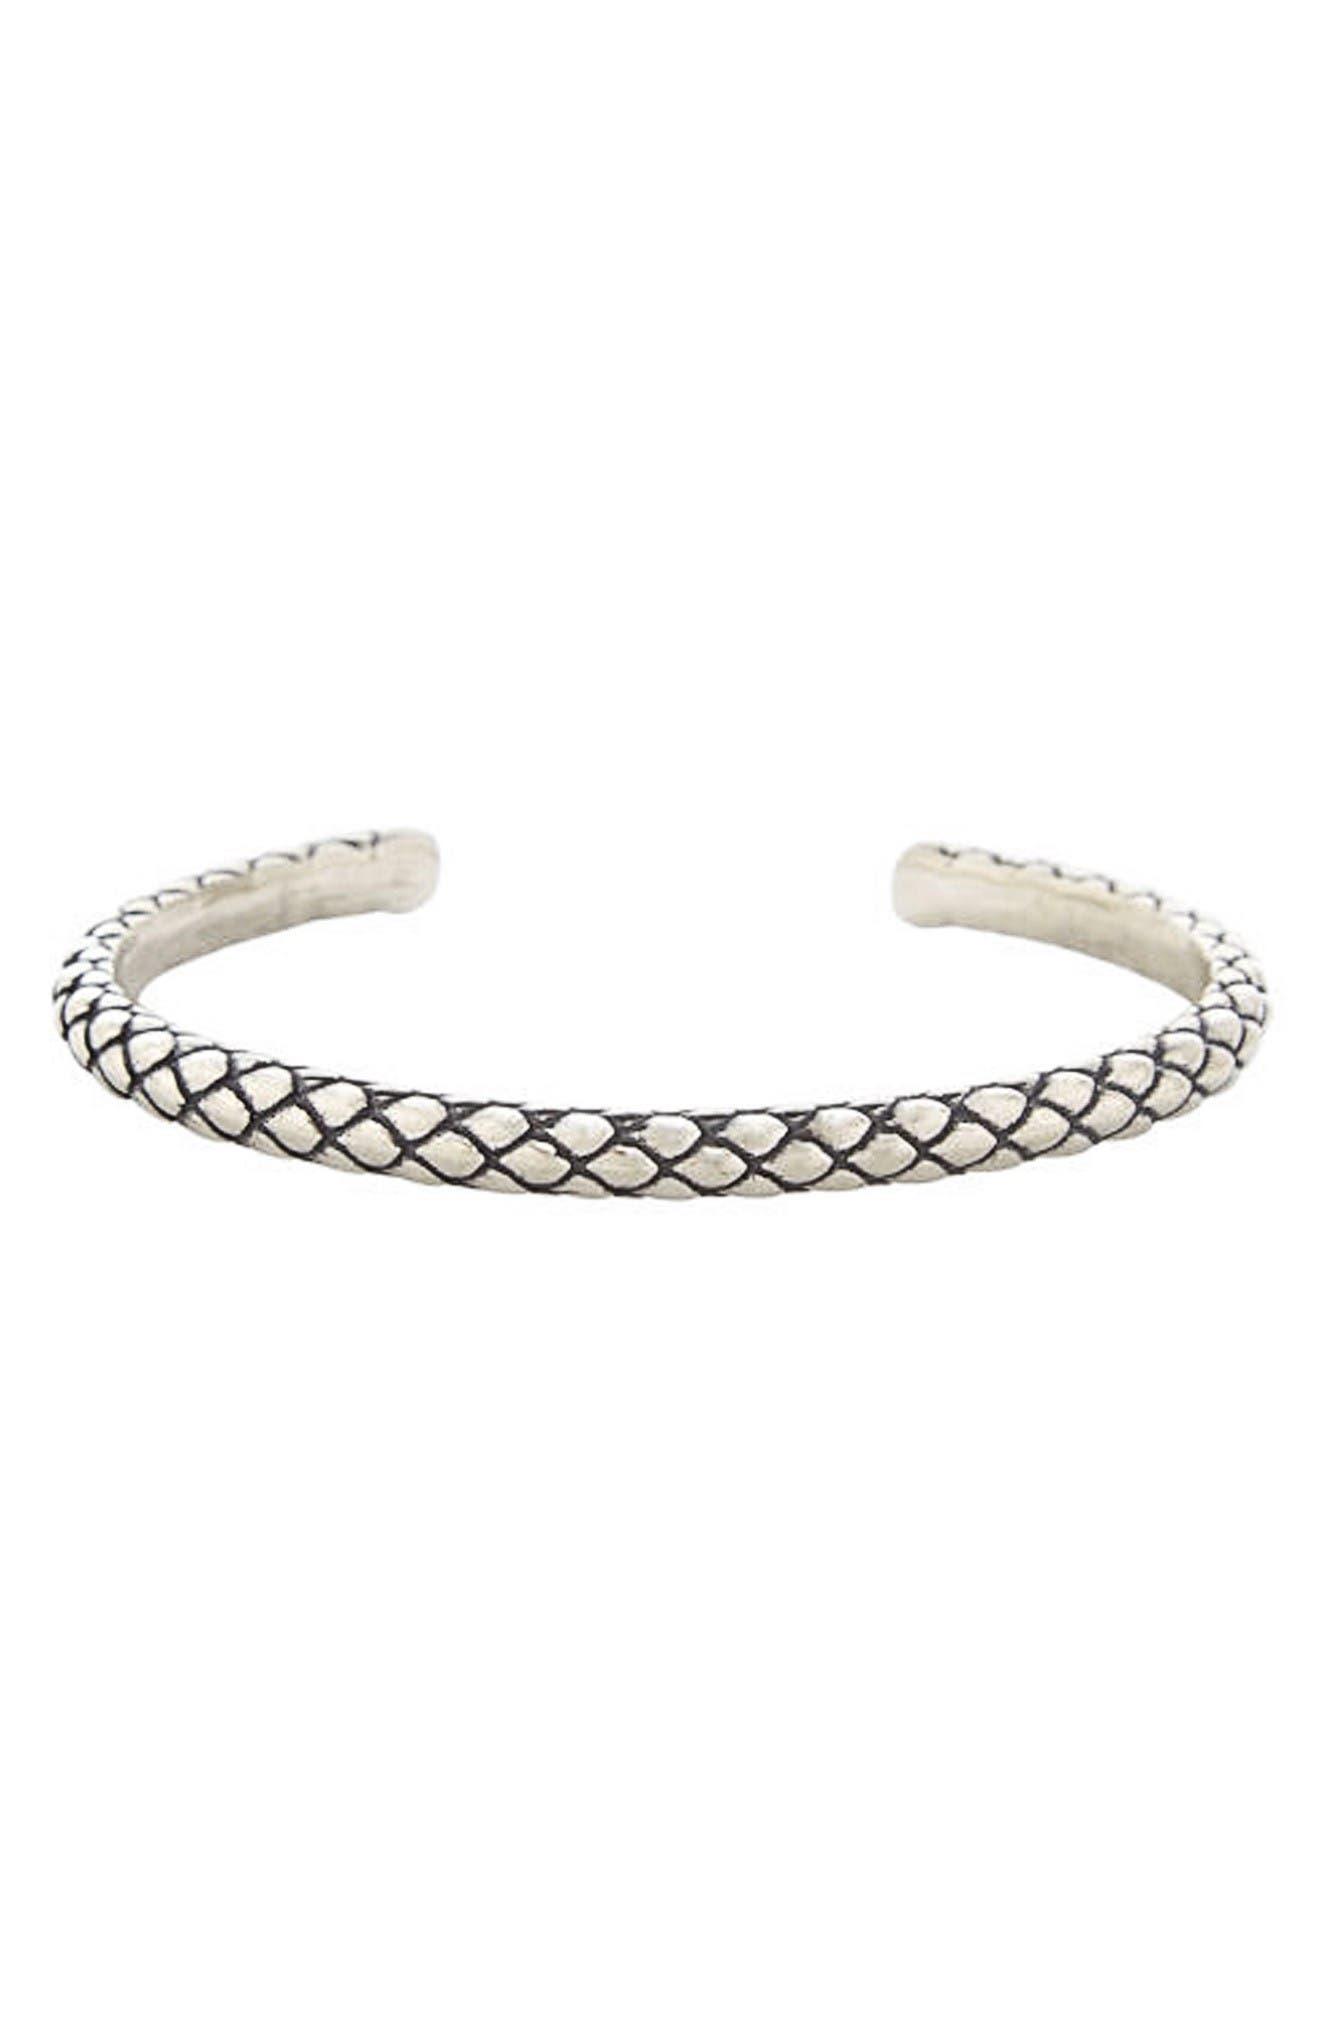 DEGS & SAL Stealth Cuff Bracelet